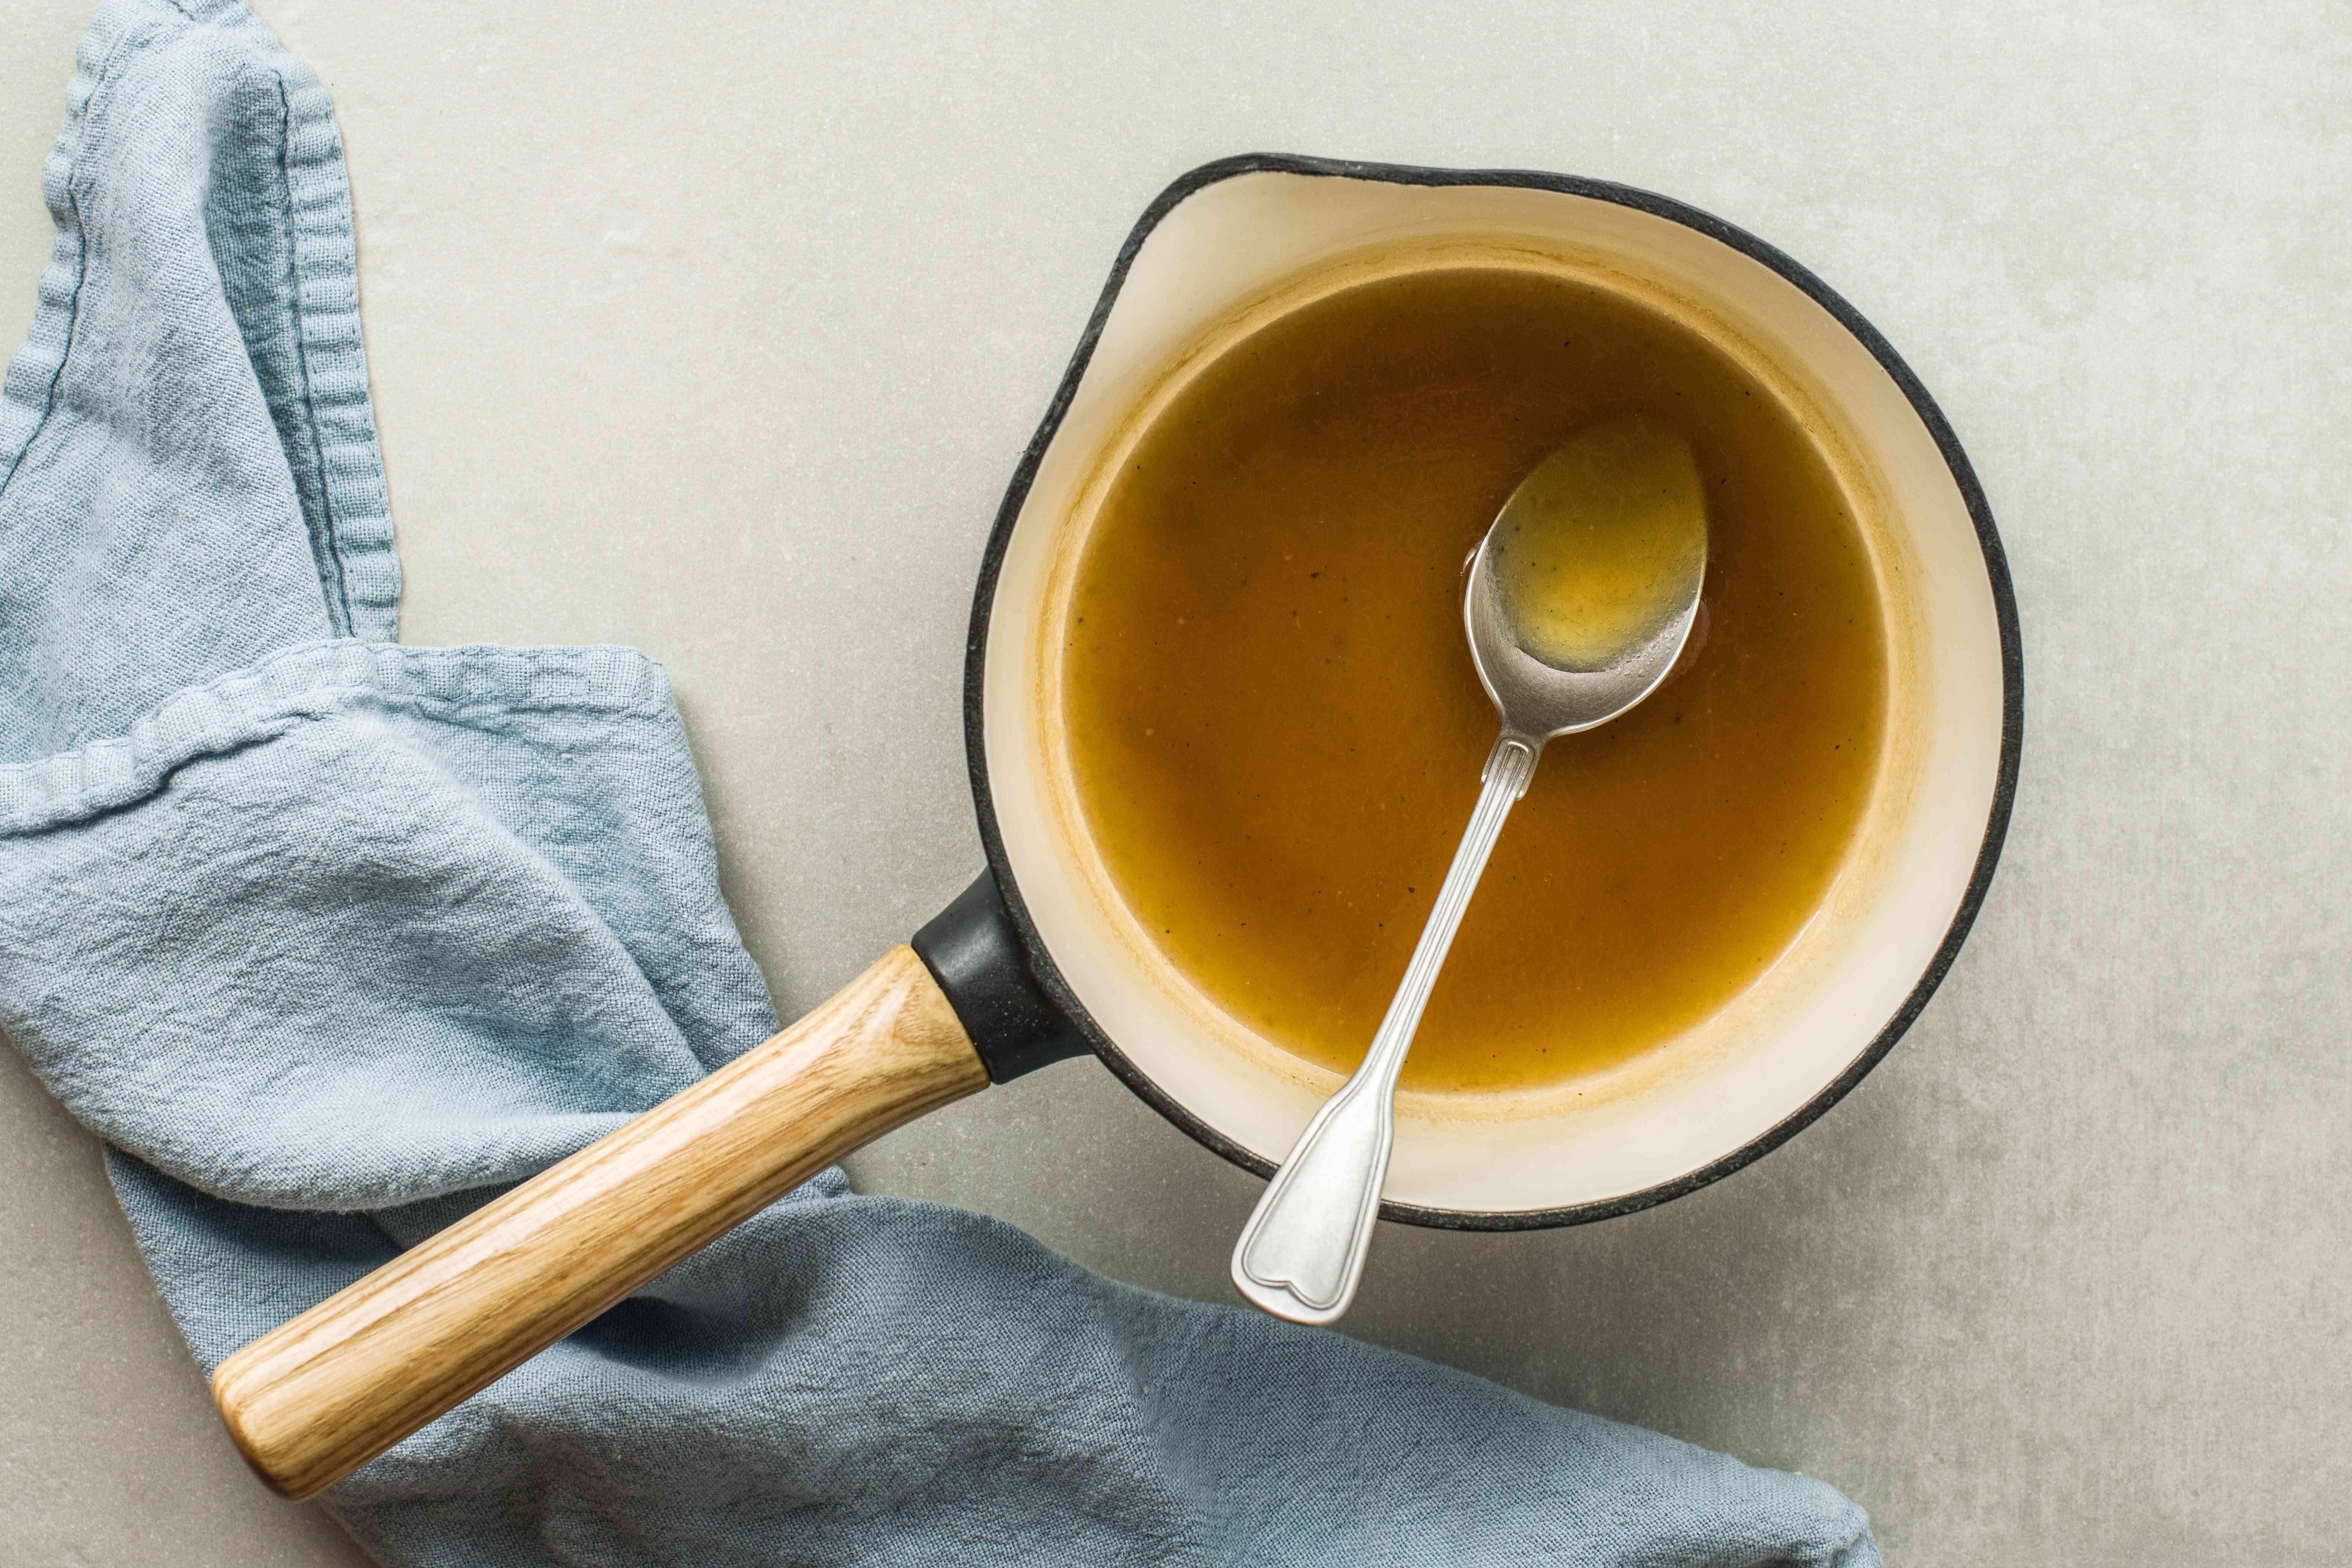 Egg foo yung sauce in a pot